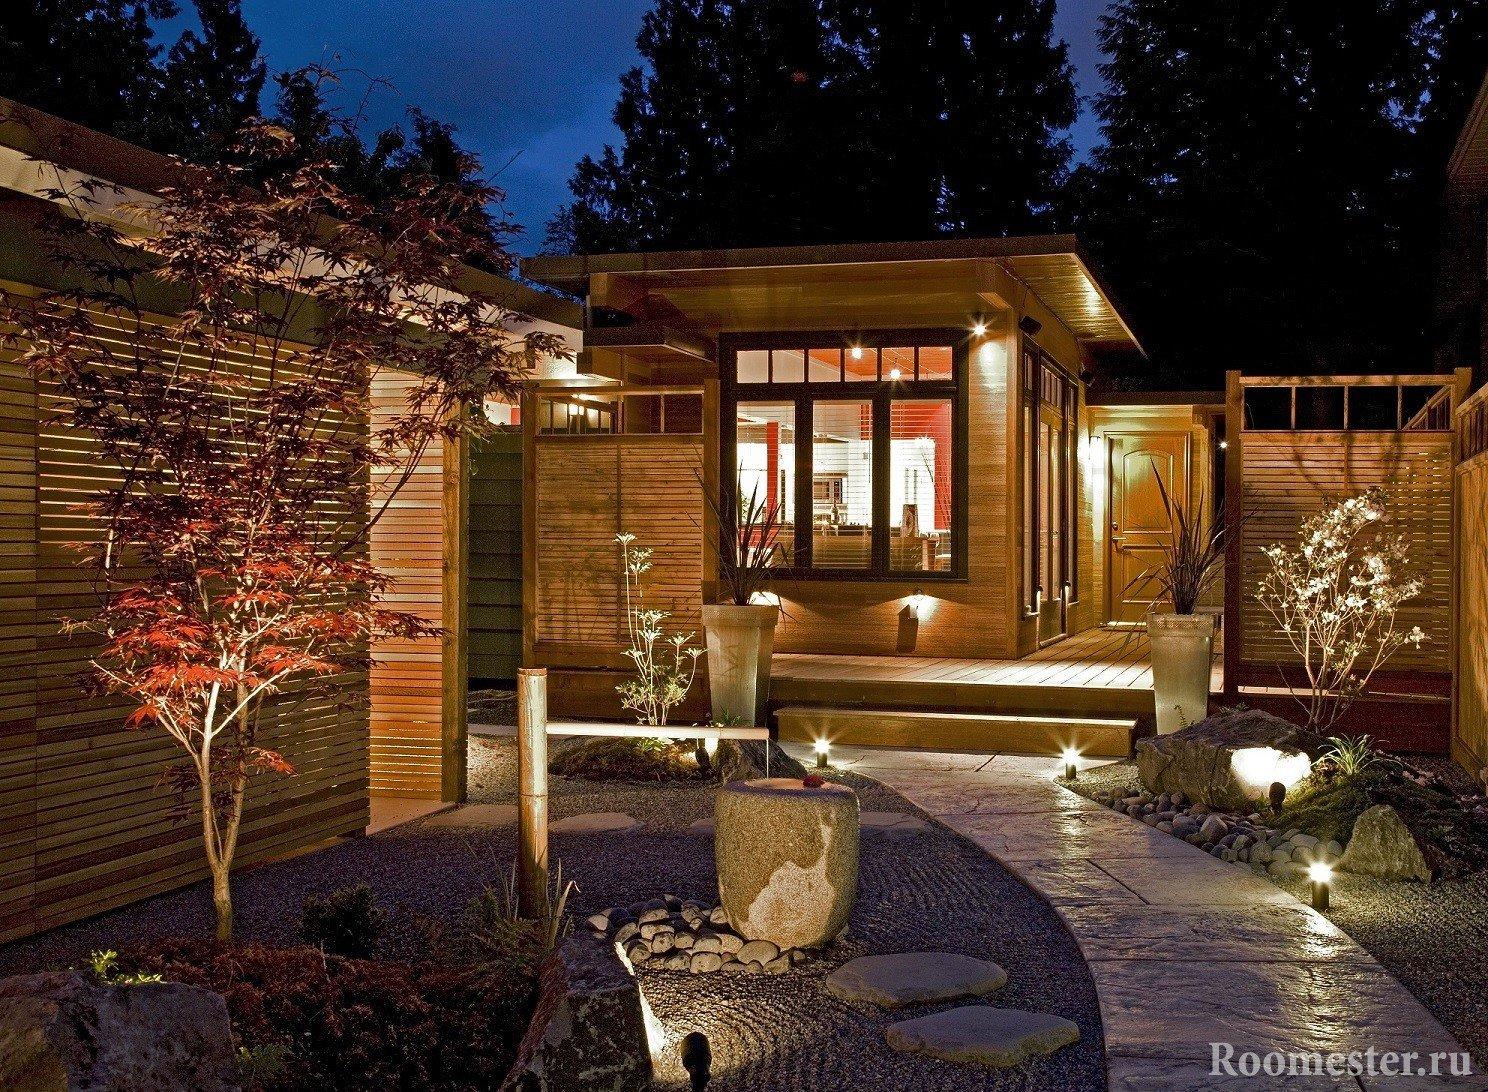 Вечерий вид двора частного дома